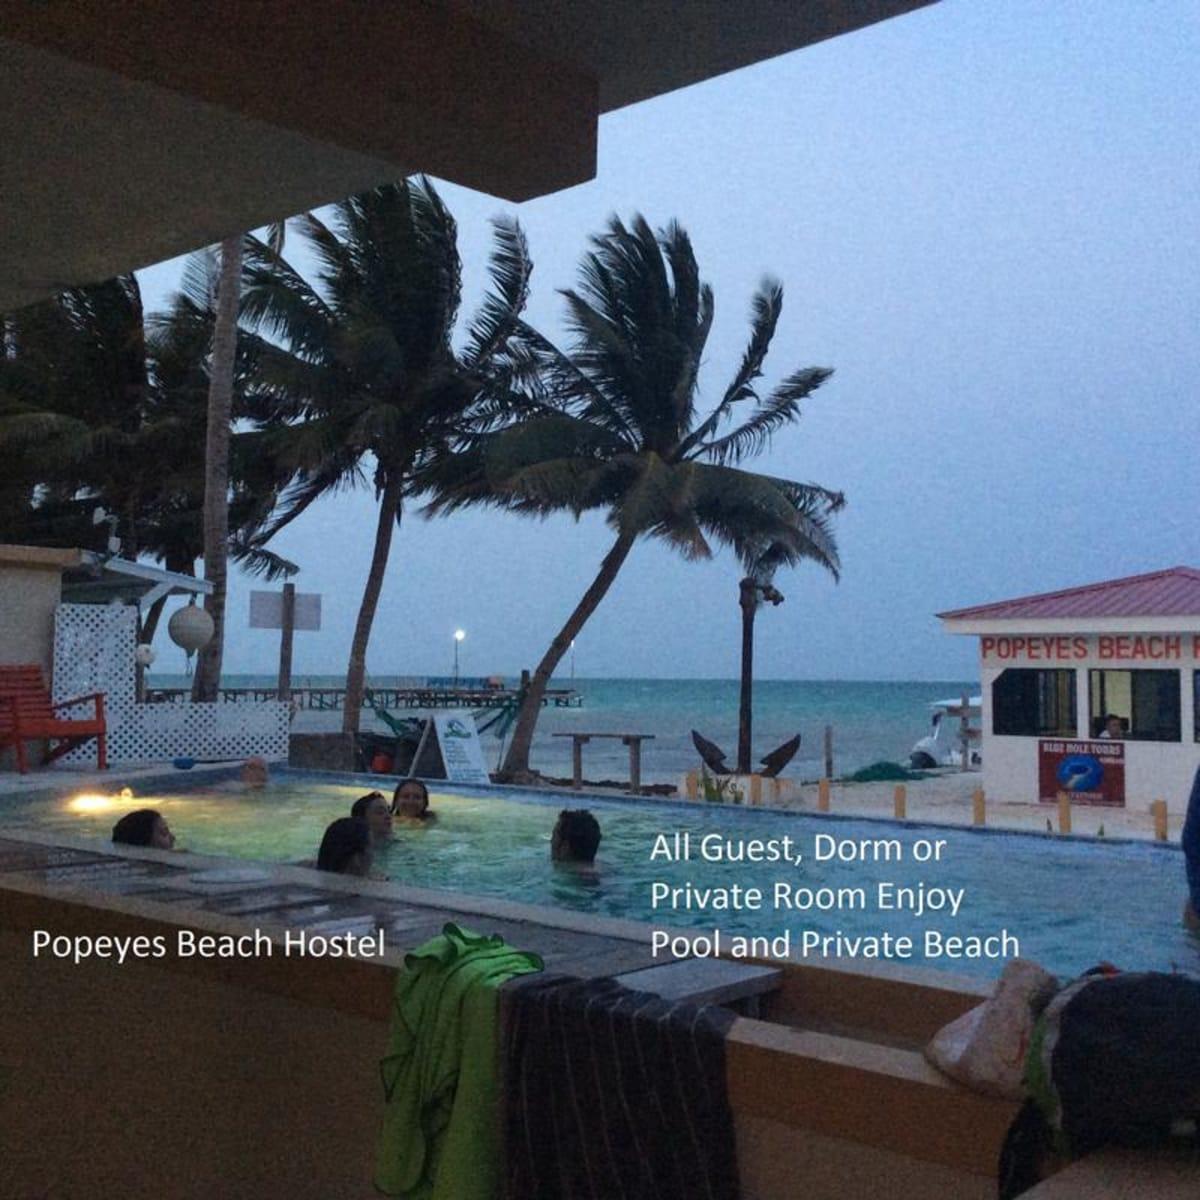 The Club Caye Caulker Beach Hostel, Caye Caulker, Belize